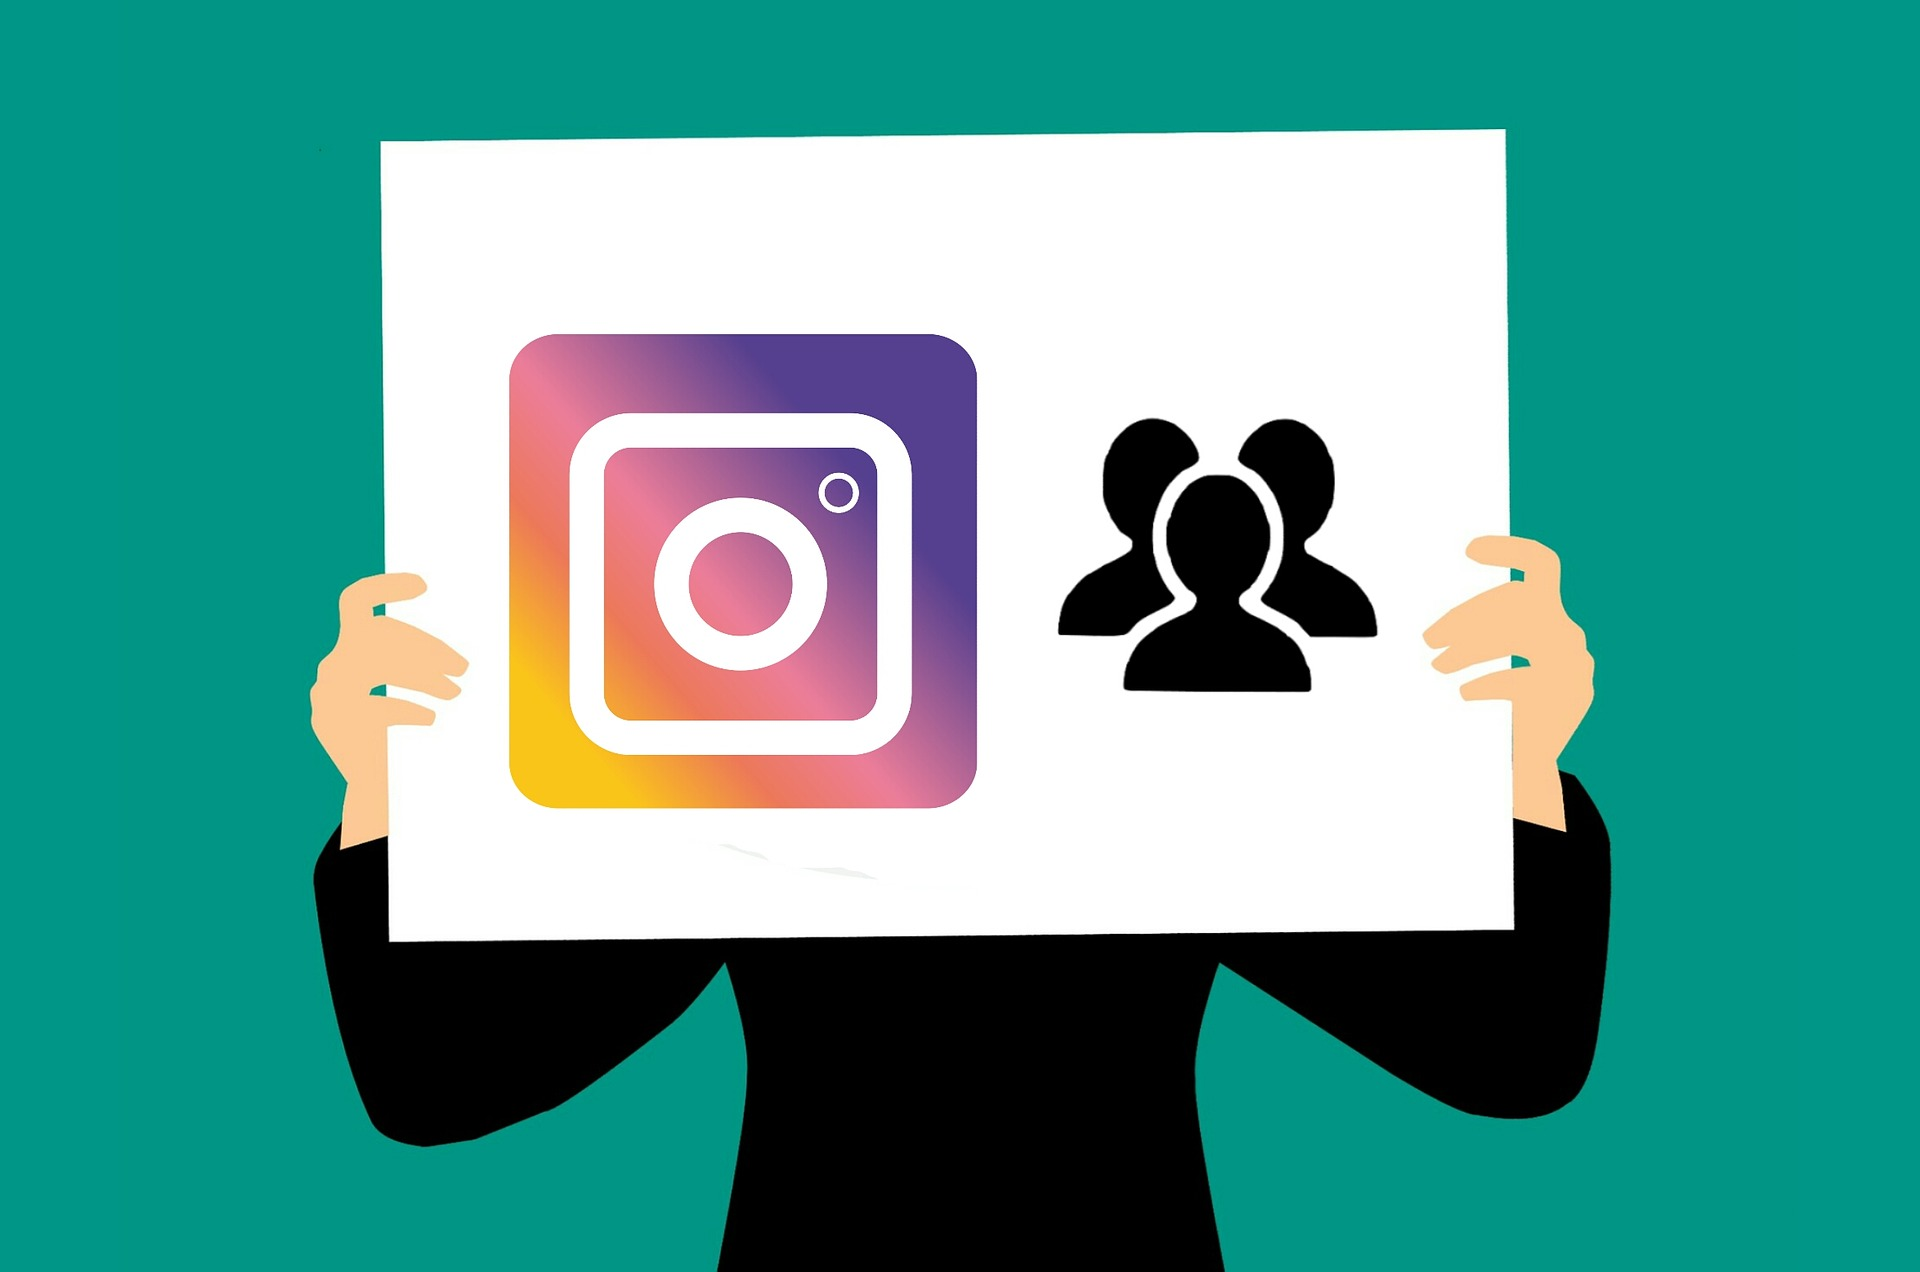 instagram-3314863_1920